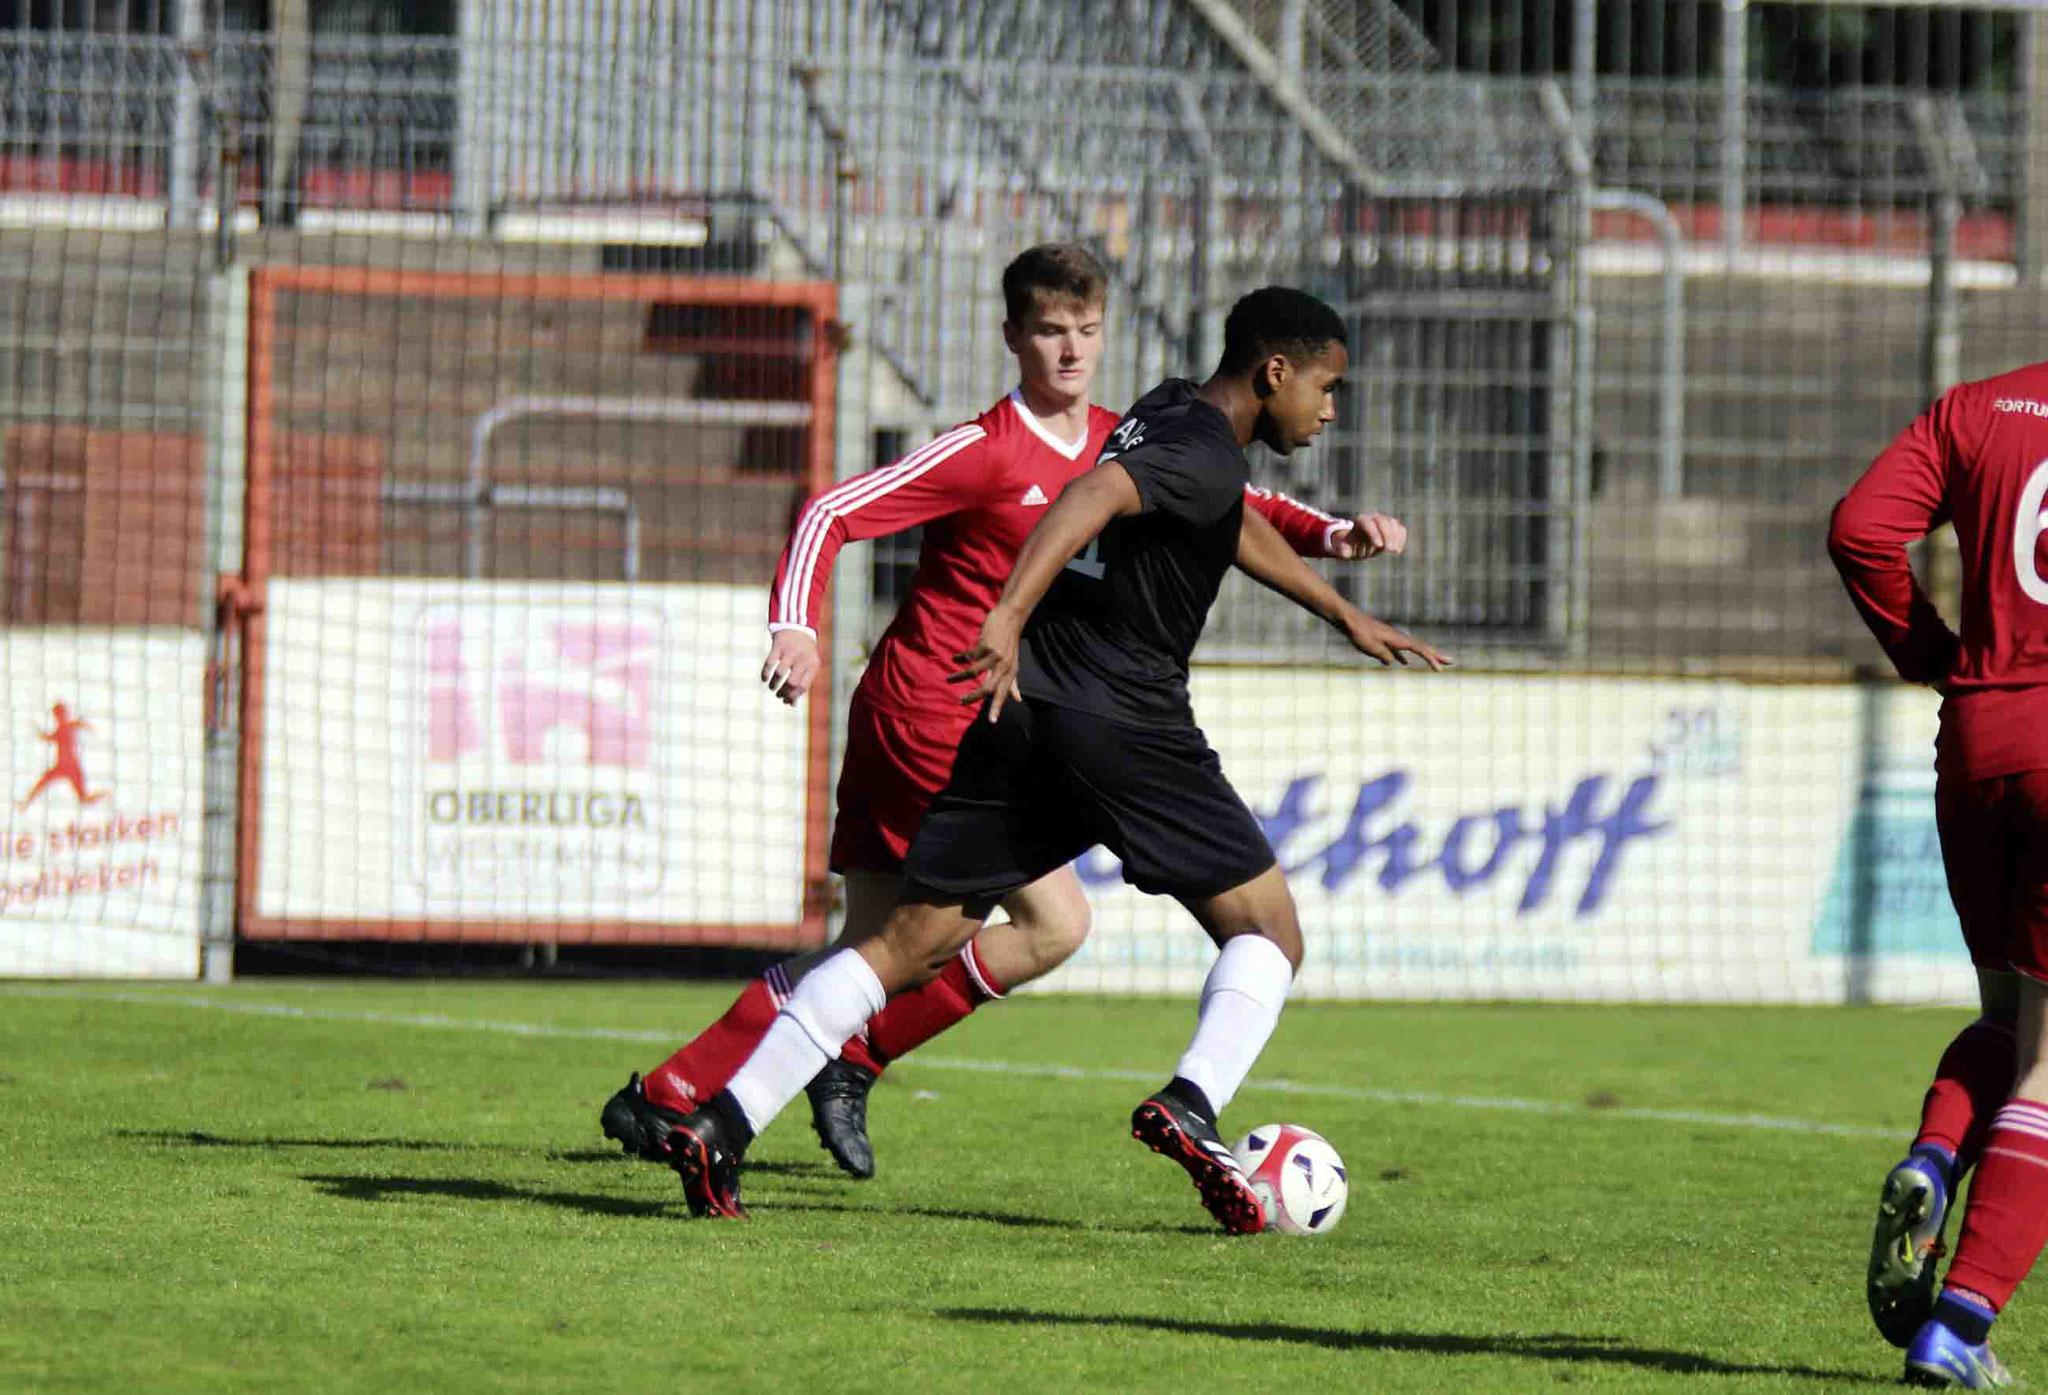 Rot Weiss Ahlen U18 gegen Fortuna Walstedde